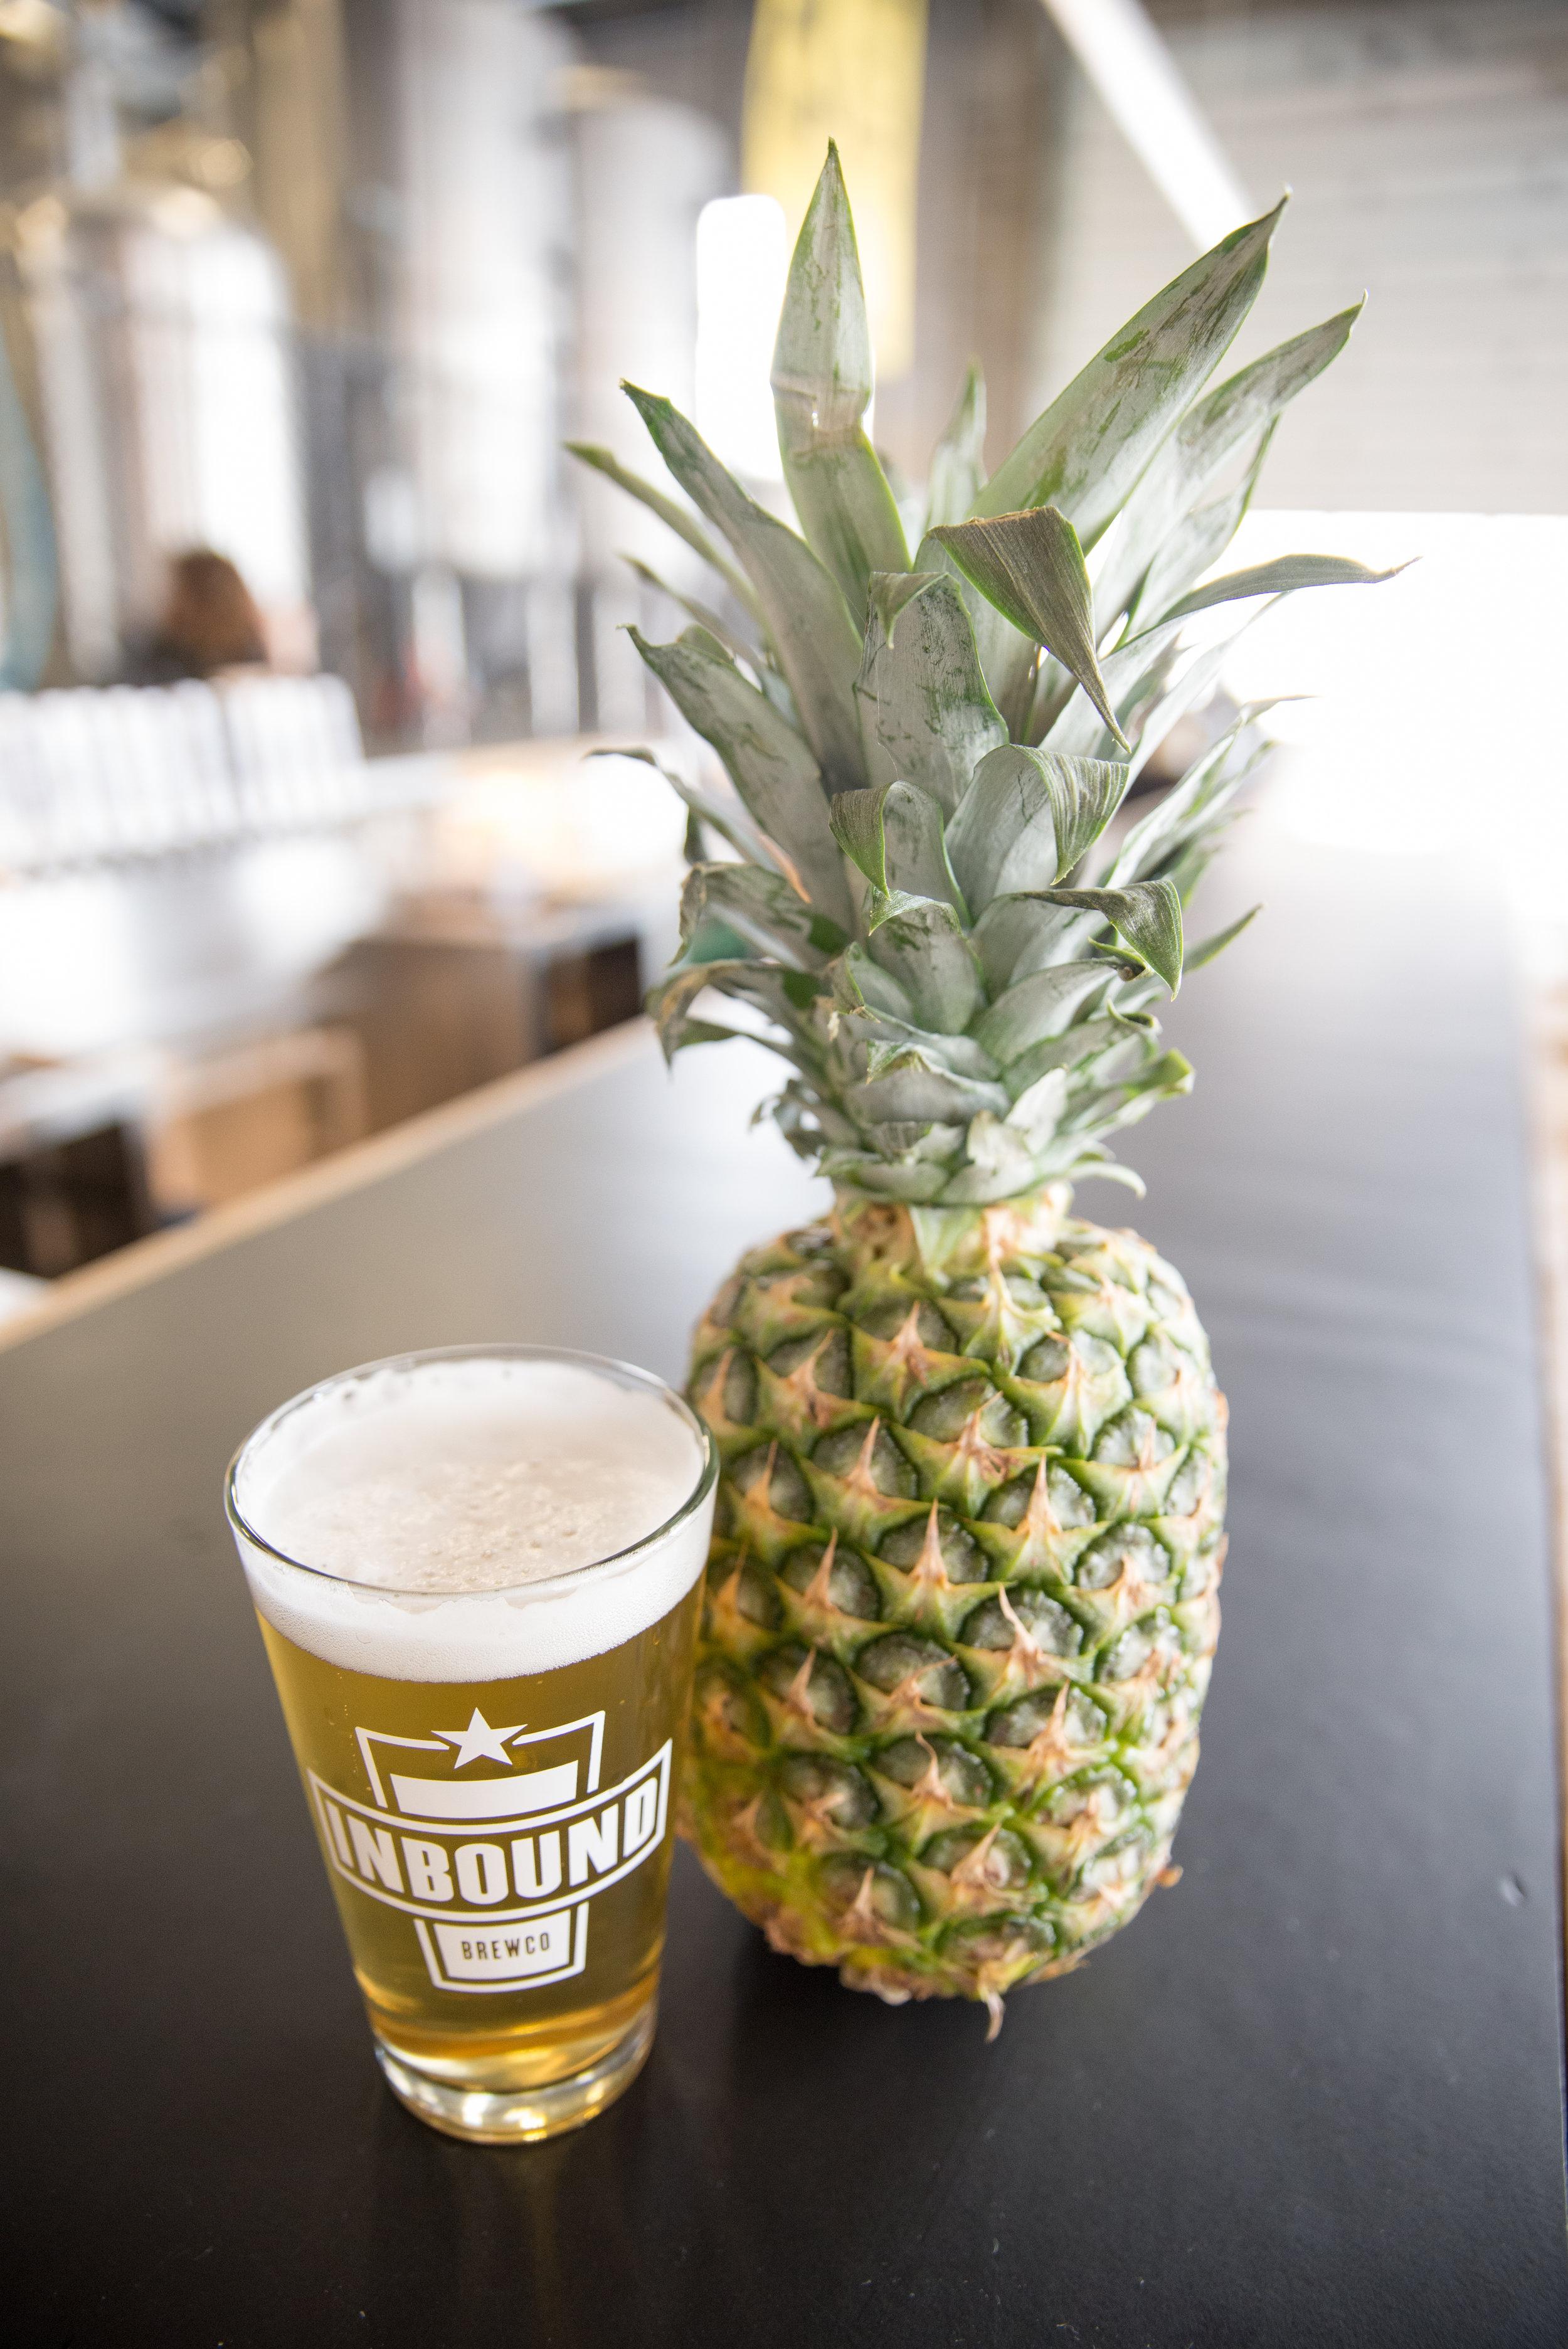 Inbound International Women's Day Beer Pineapple Gose